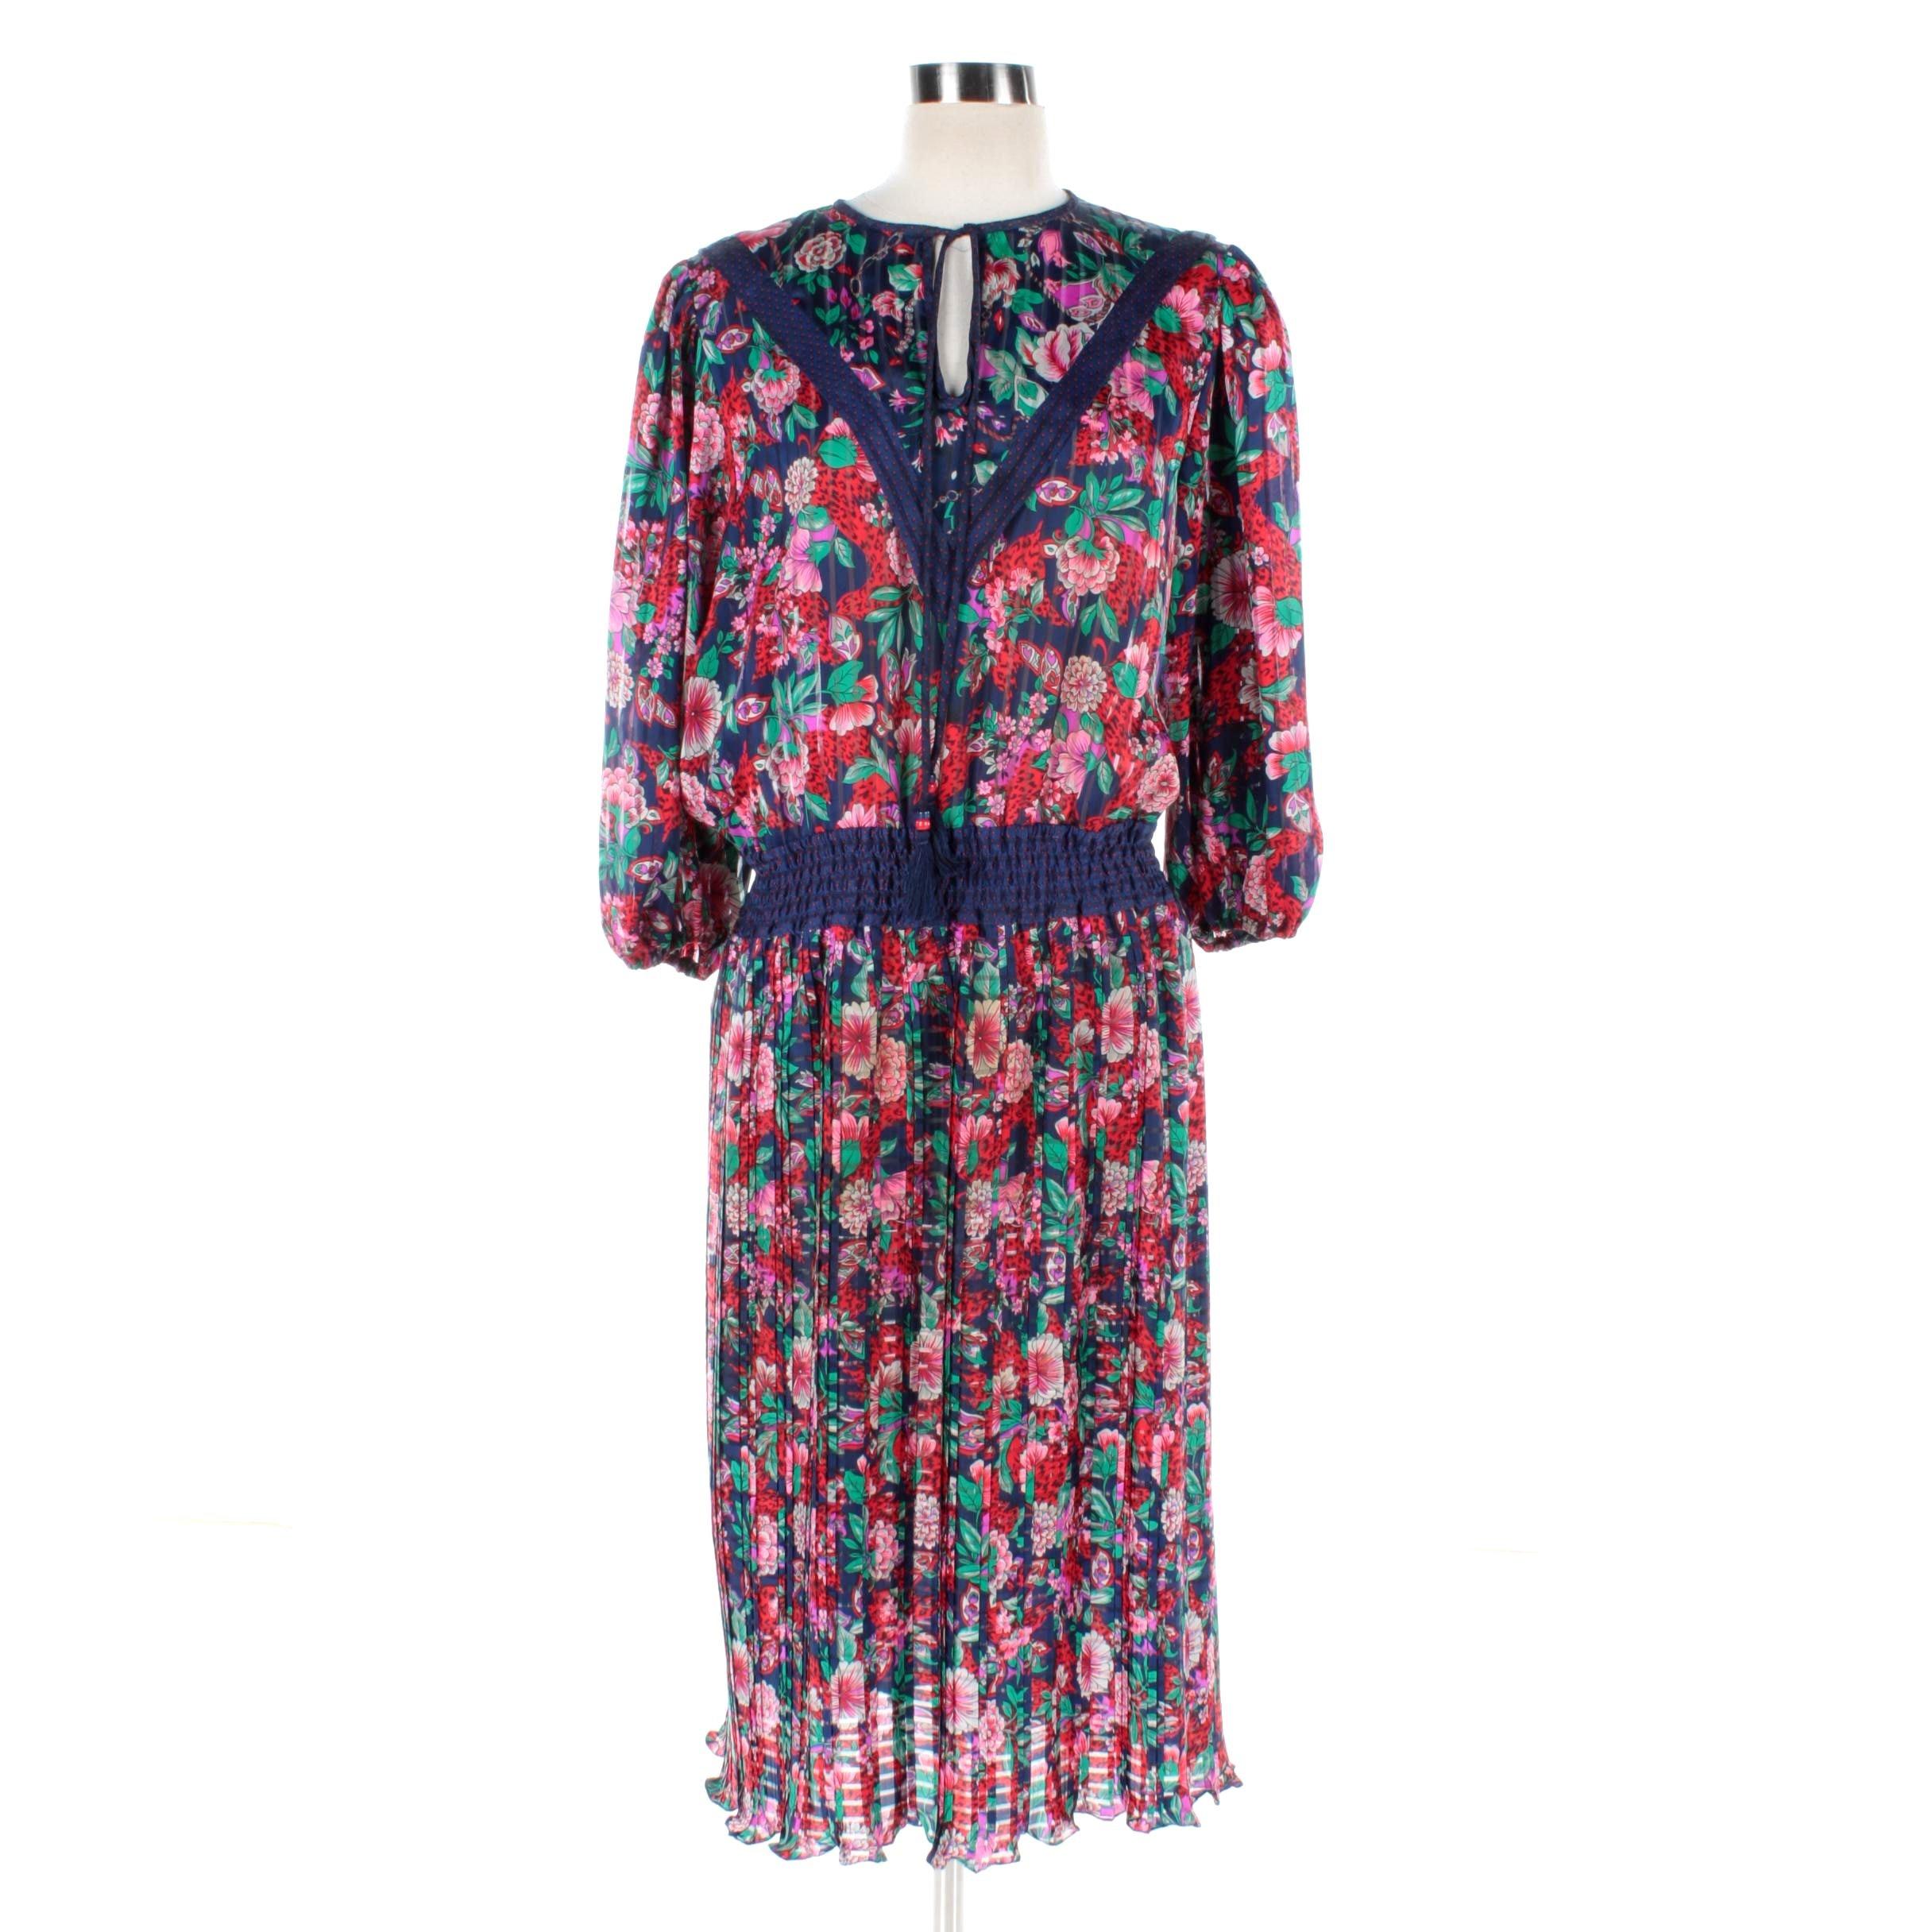 Women's Diane Freis Floral Dress